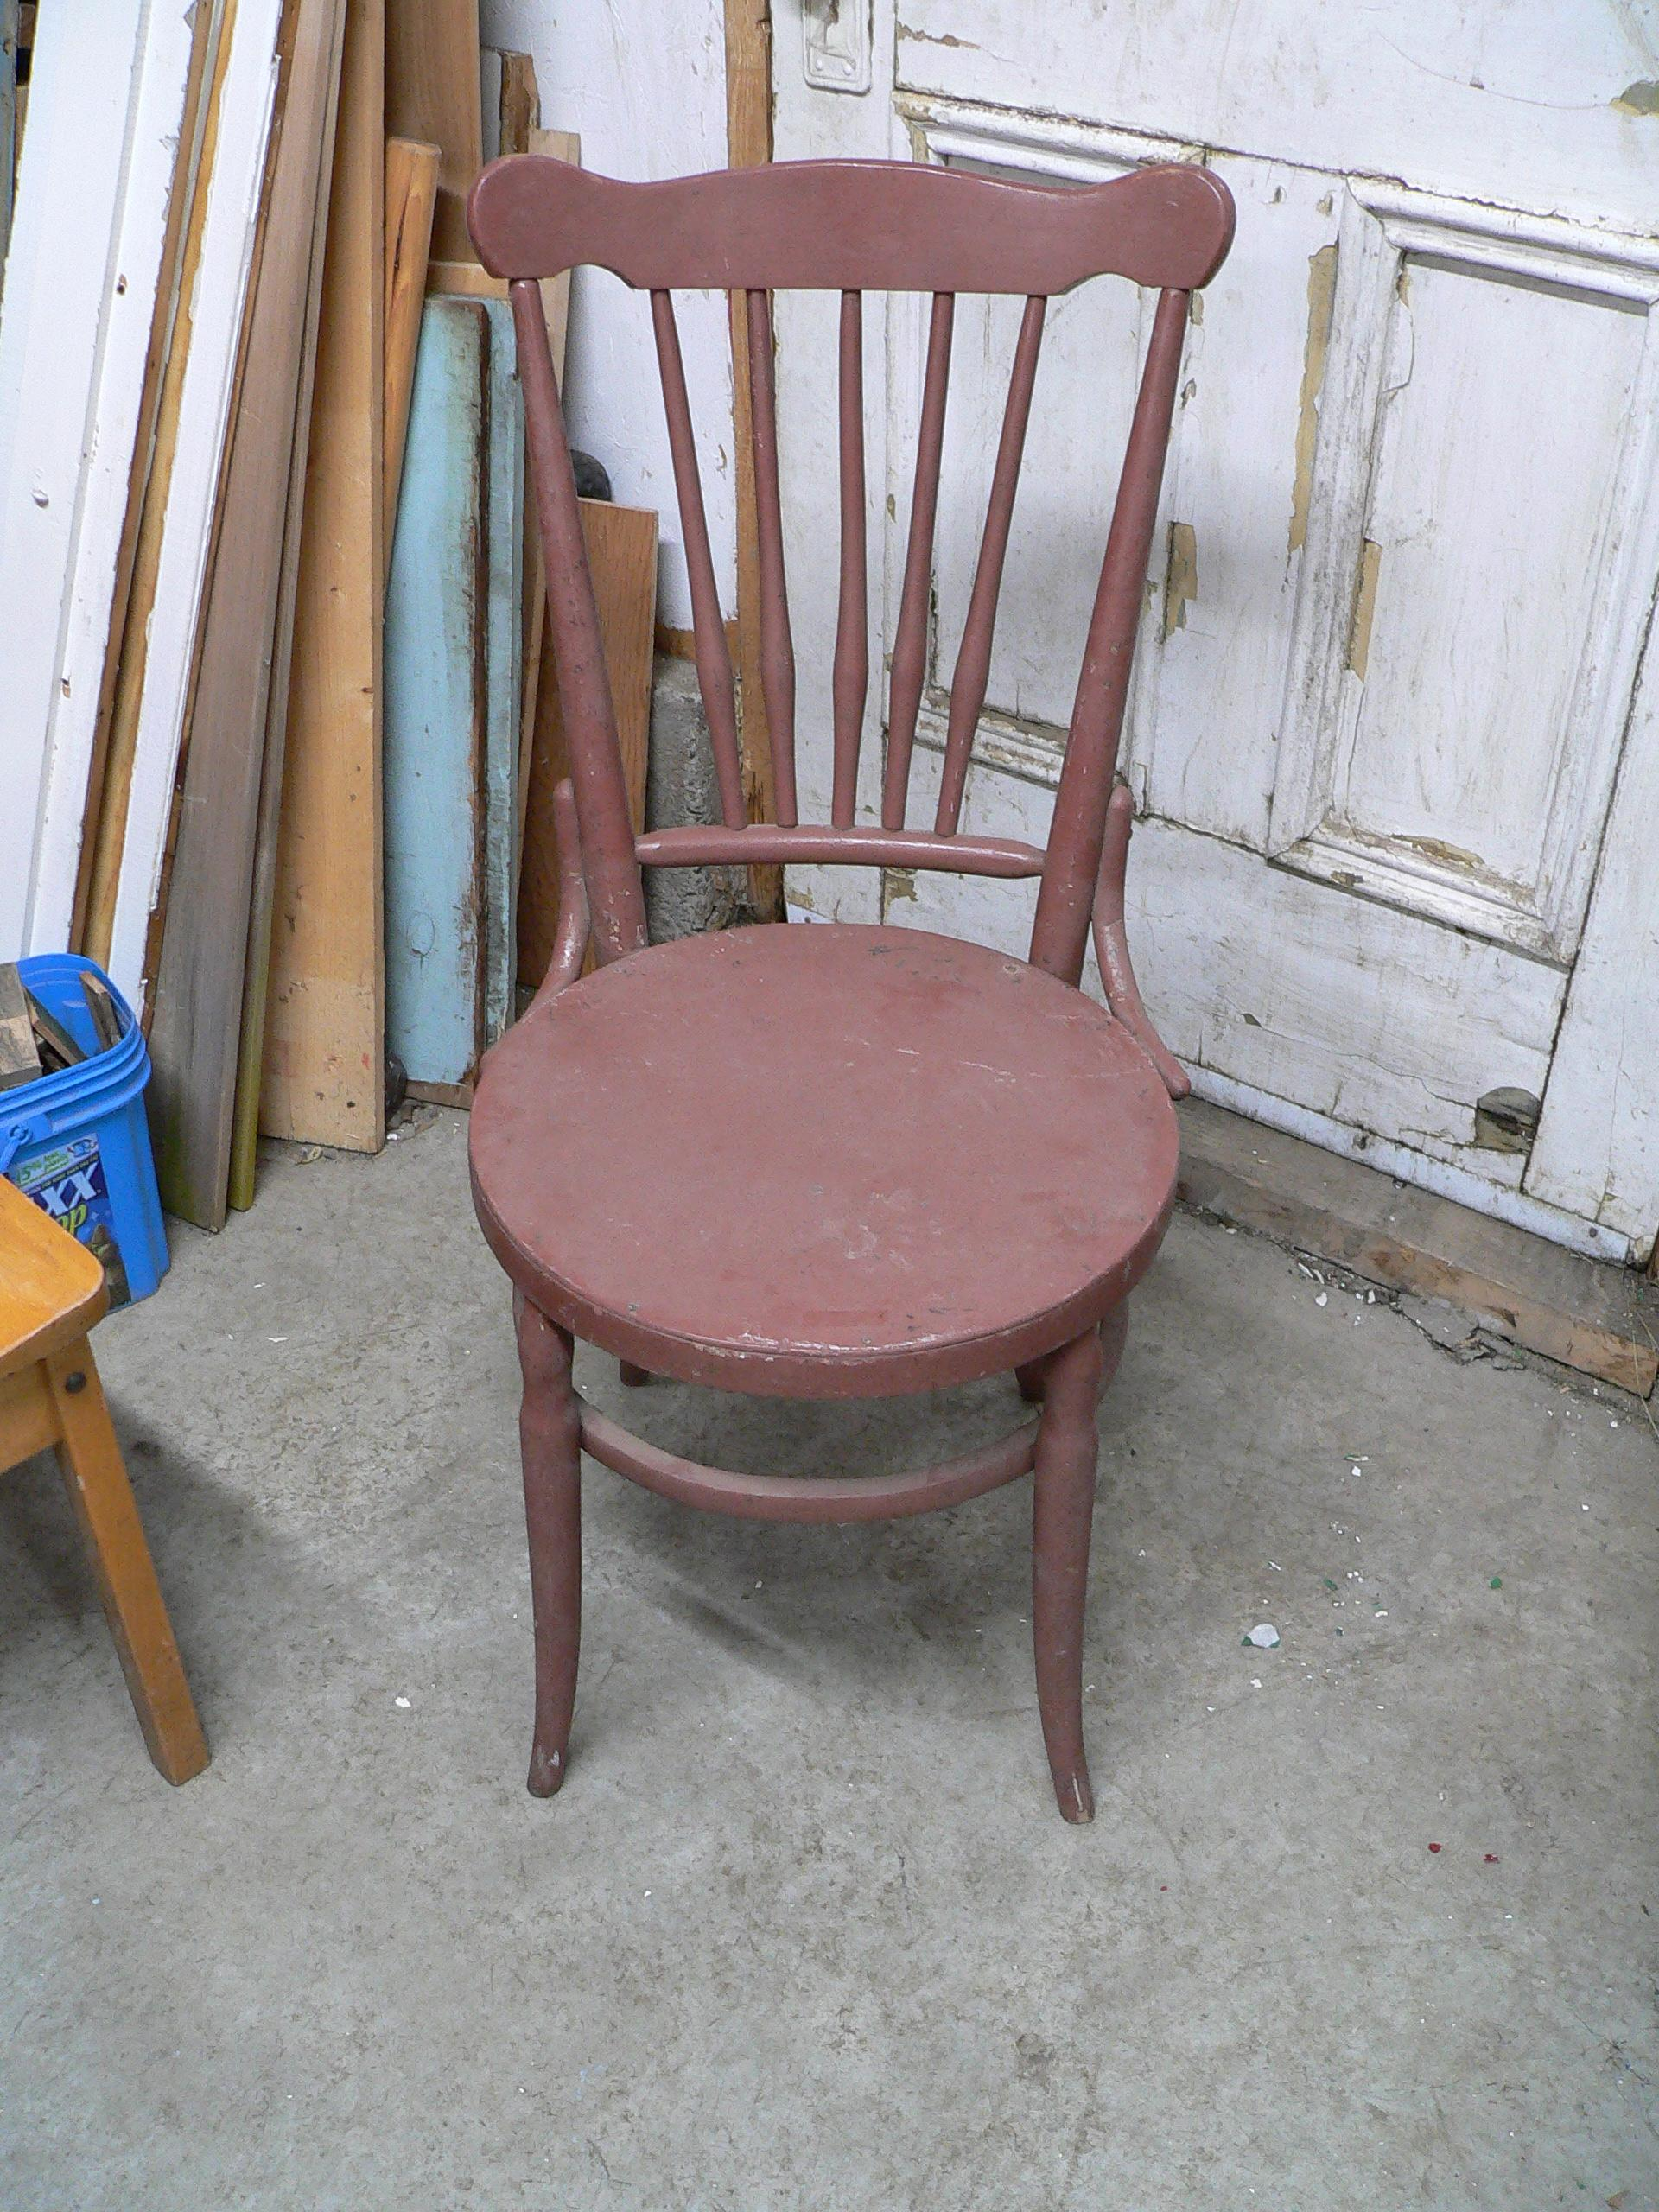 Chaise antique bistro # 5892.22